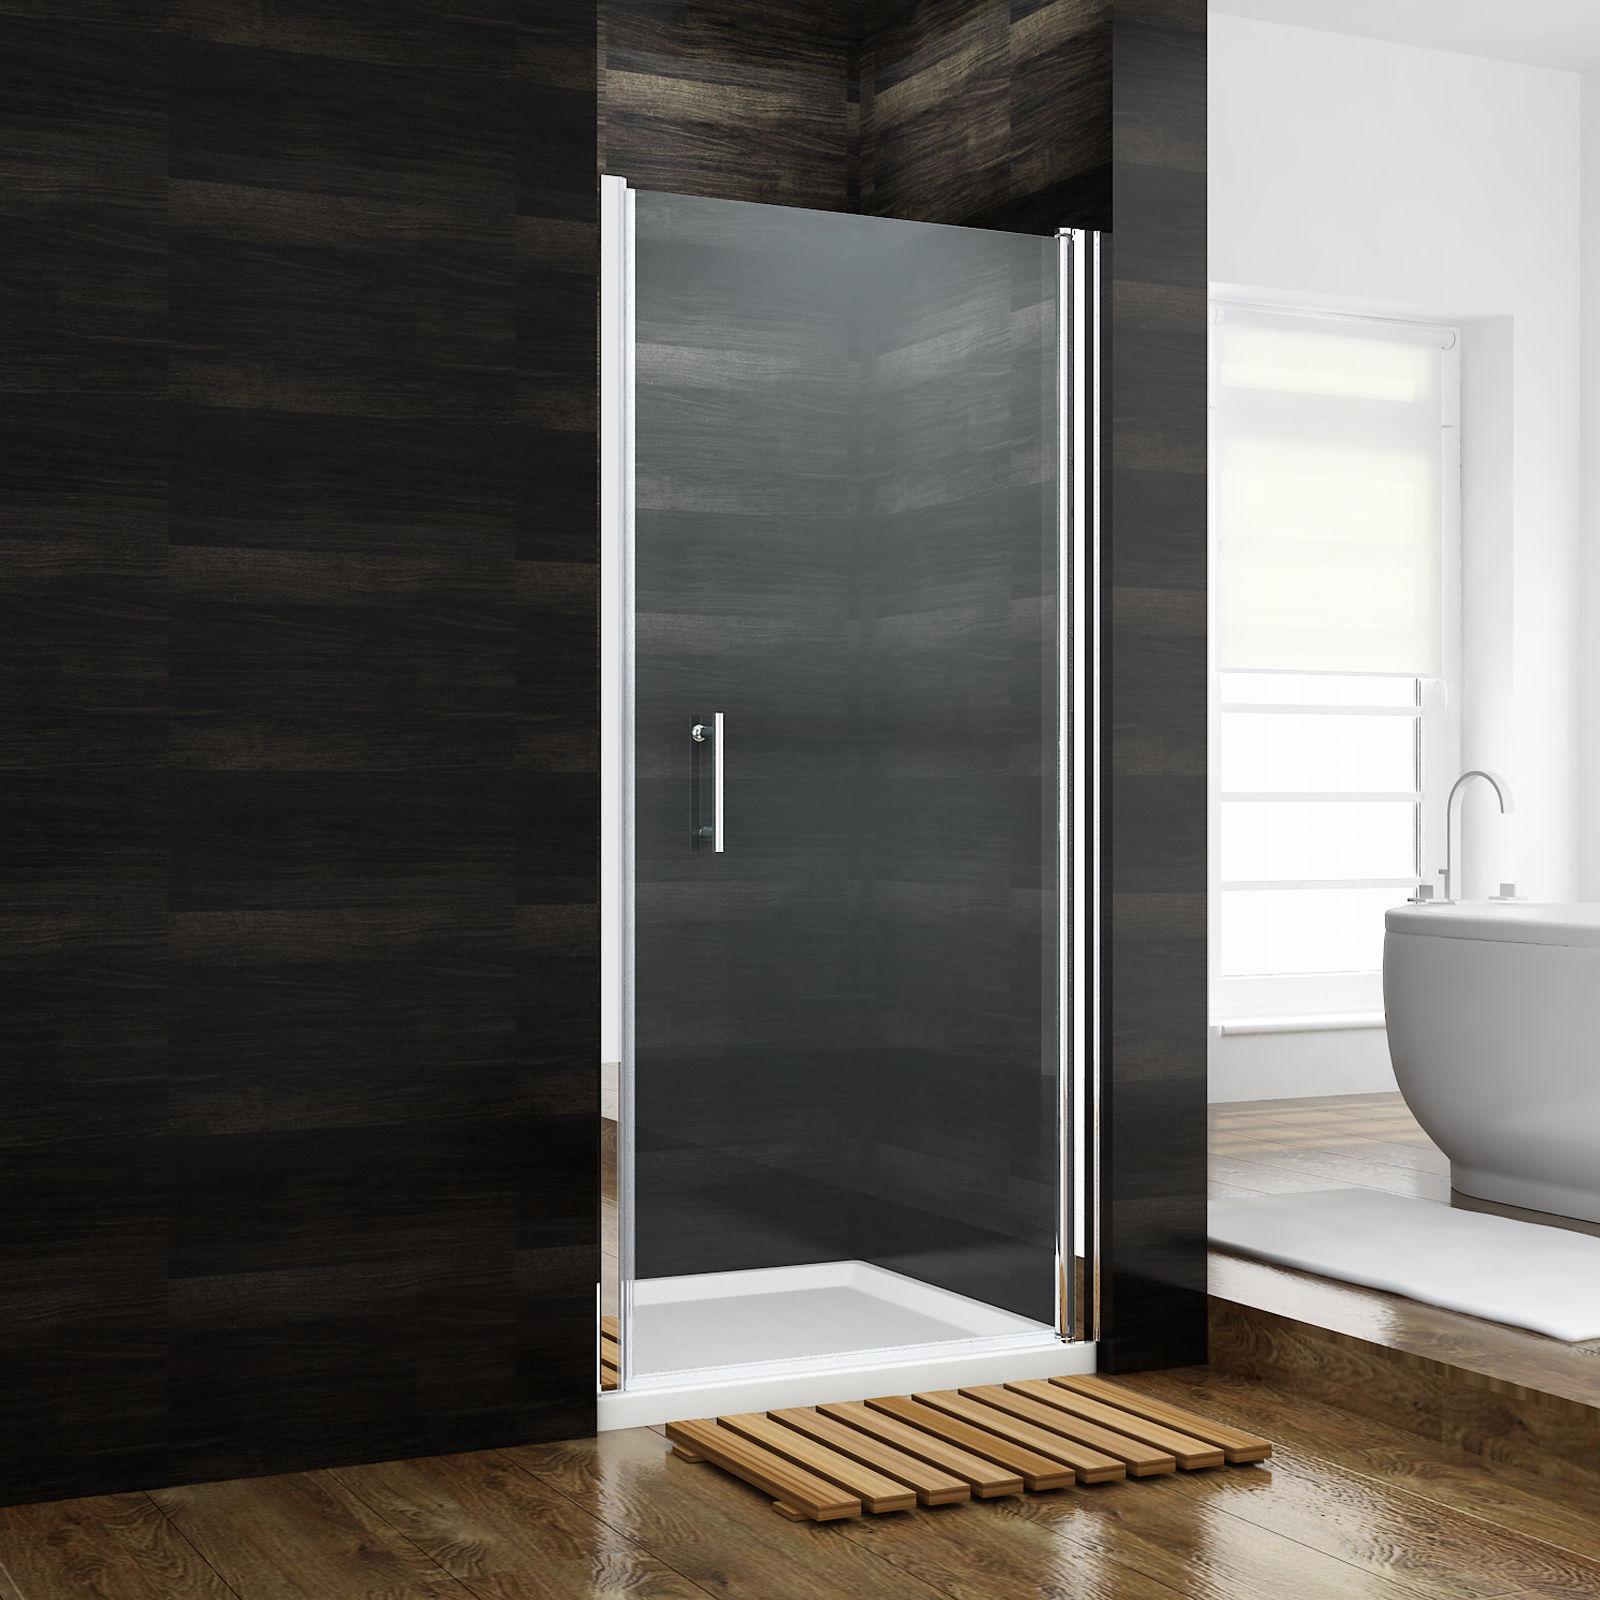 Details About Sunny Shower 31 1 4x72 In Semi Frameless Glass Pivot Shower Door Chrome Finish